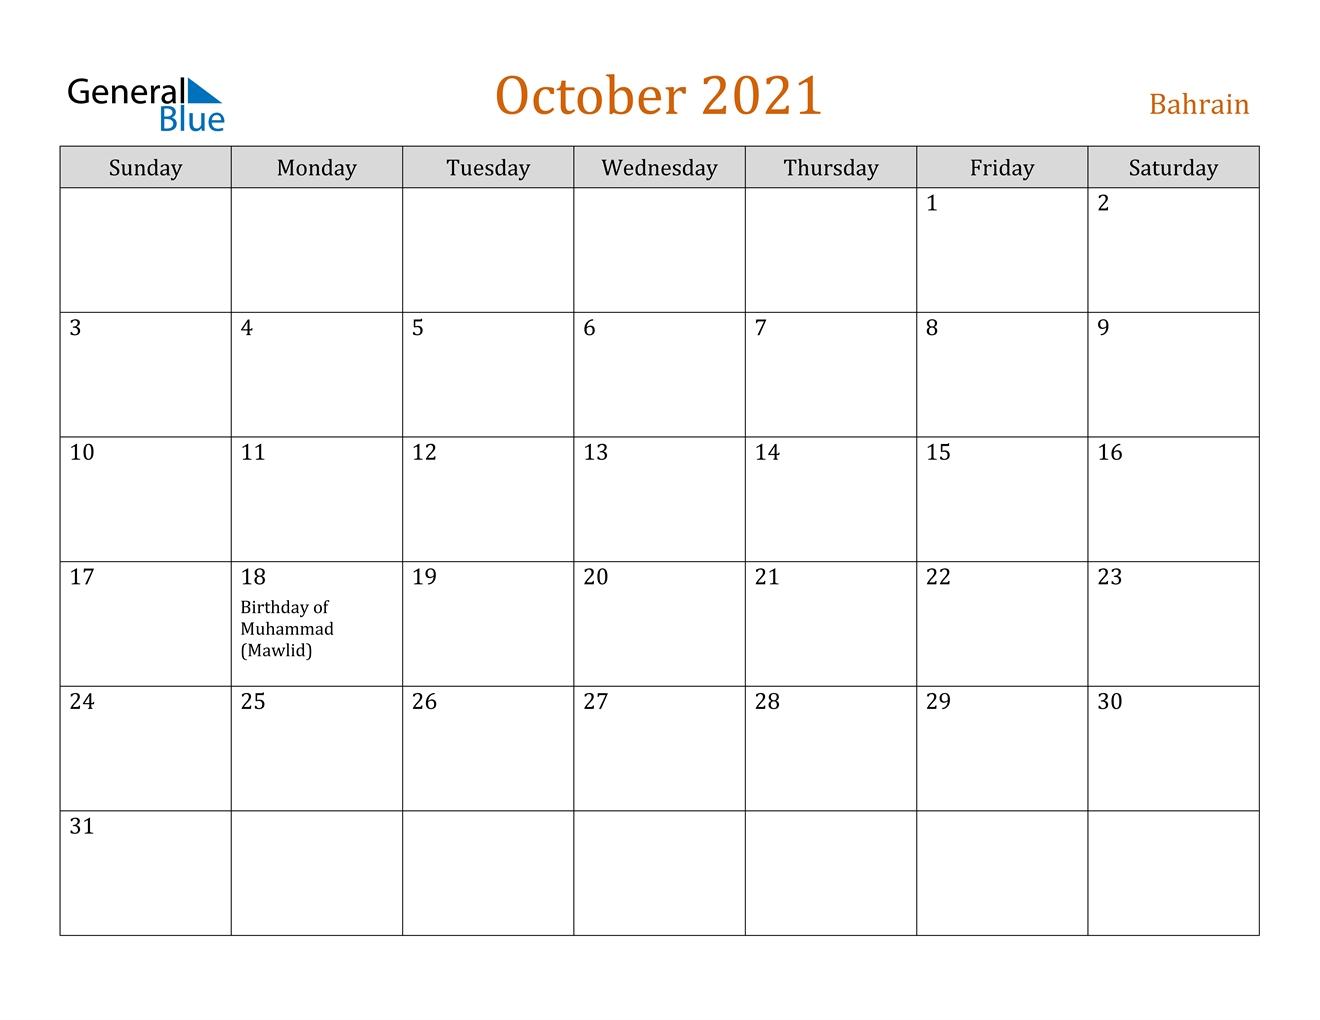 October 2021 Calendar - Bahrain